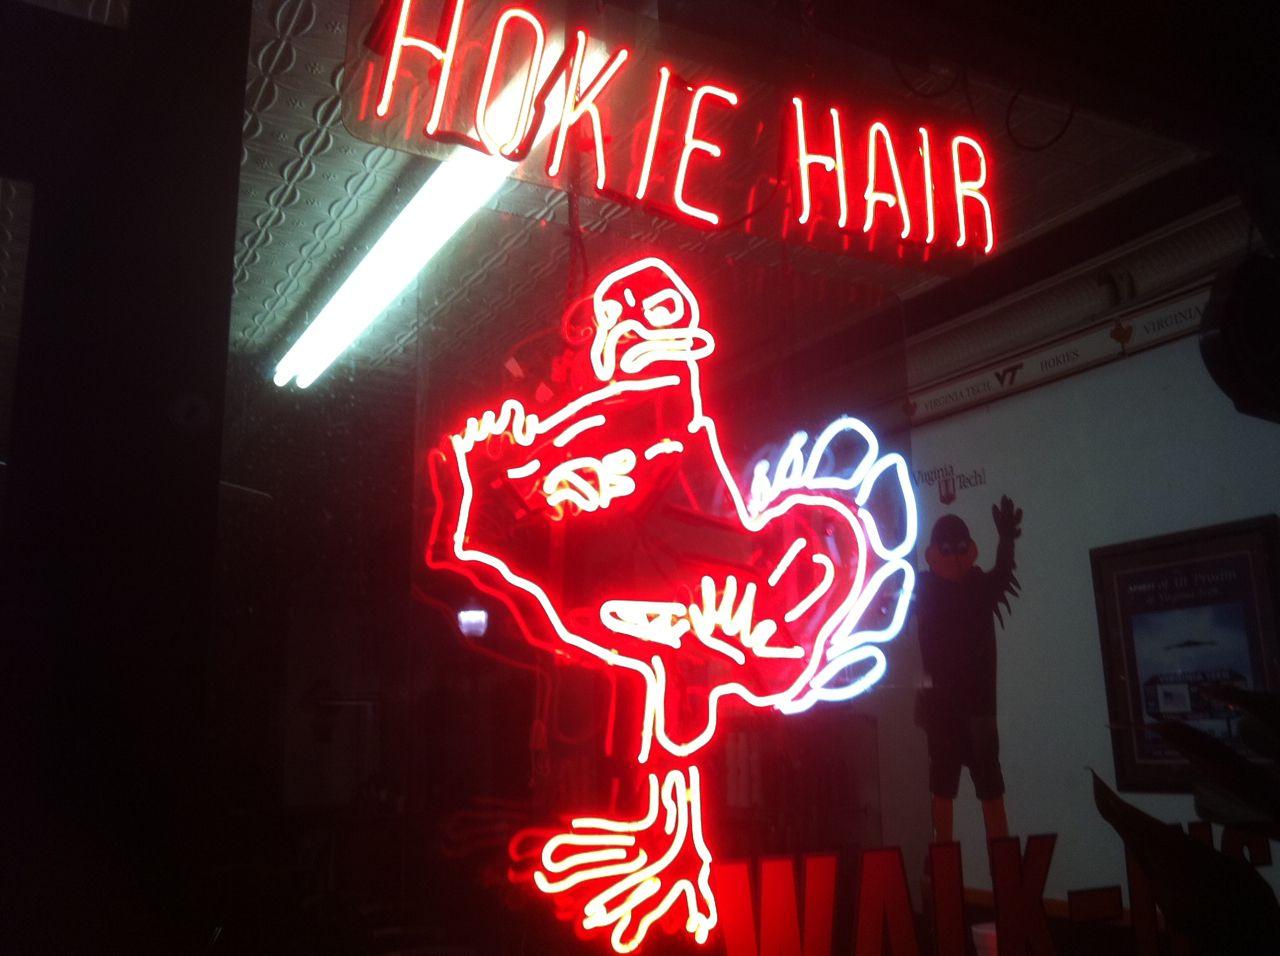 Hokie Hair (With images) Virginia tech, Virginia tech